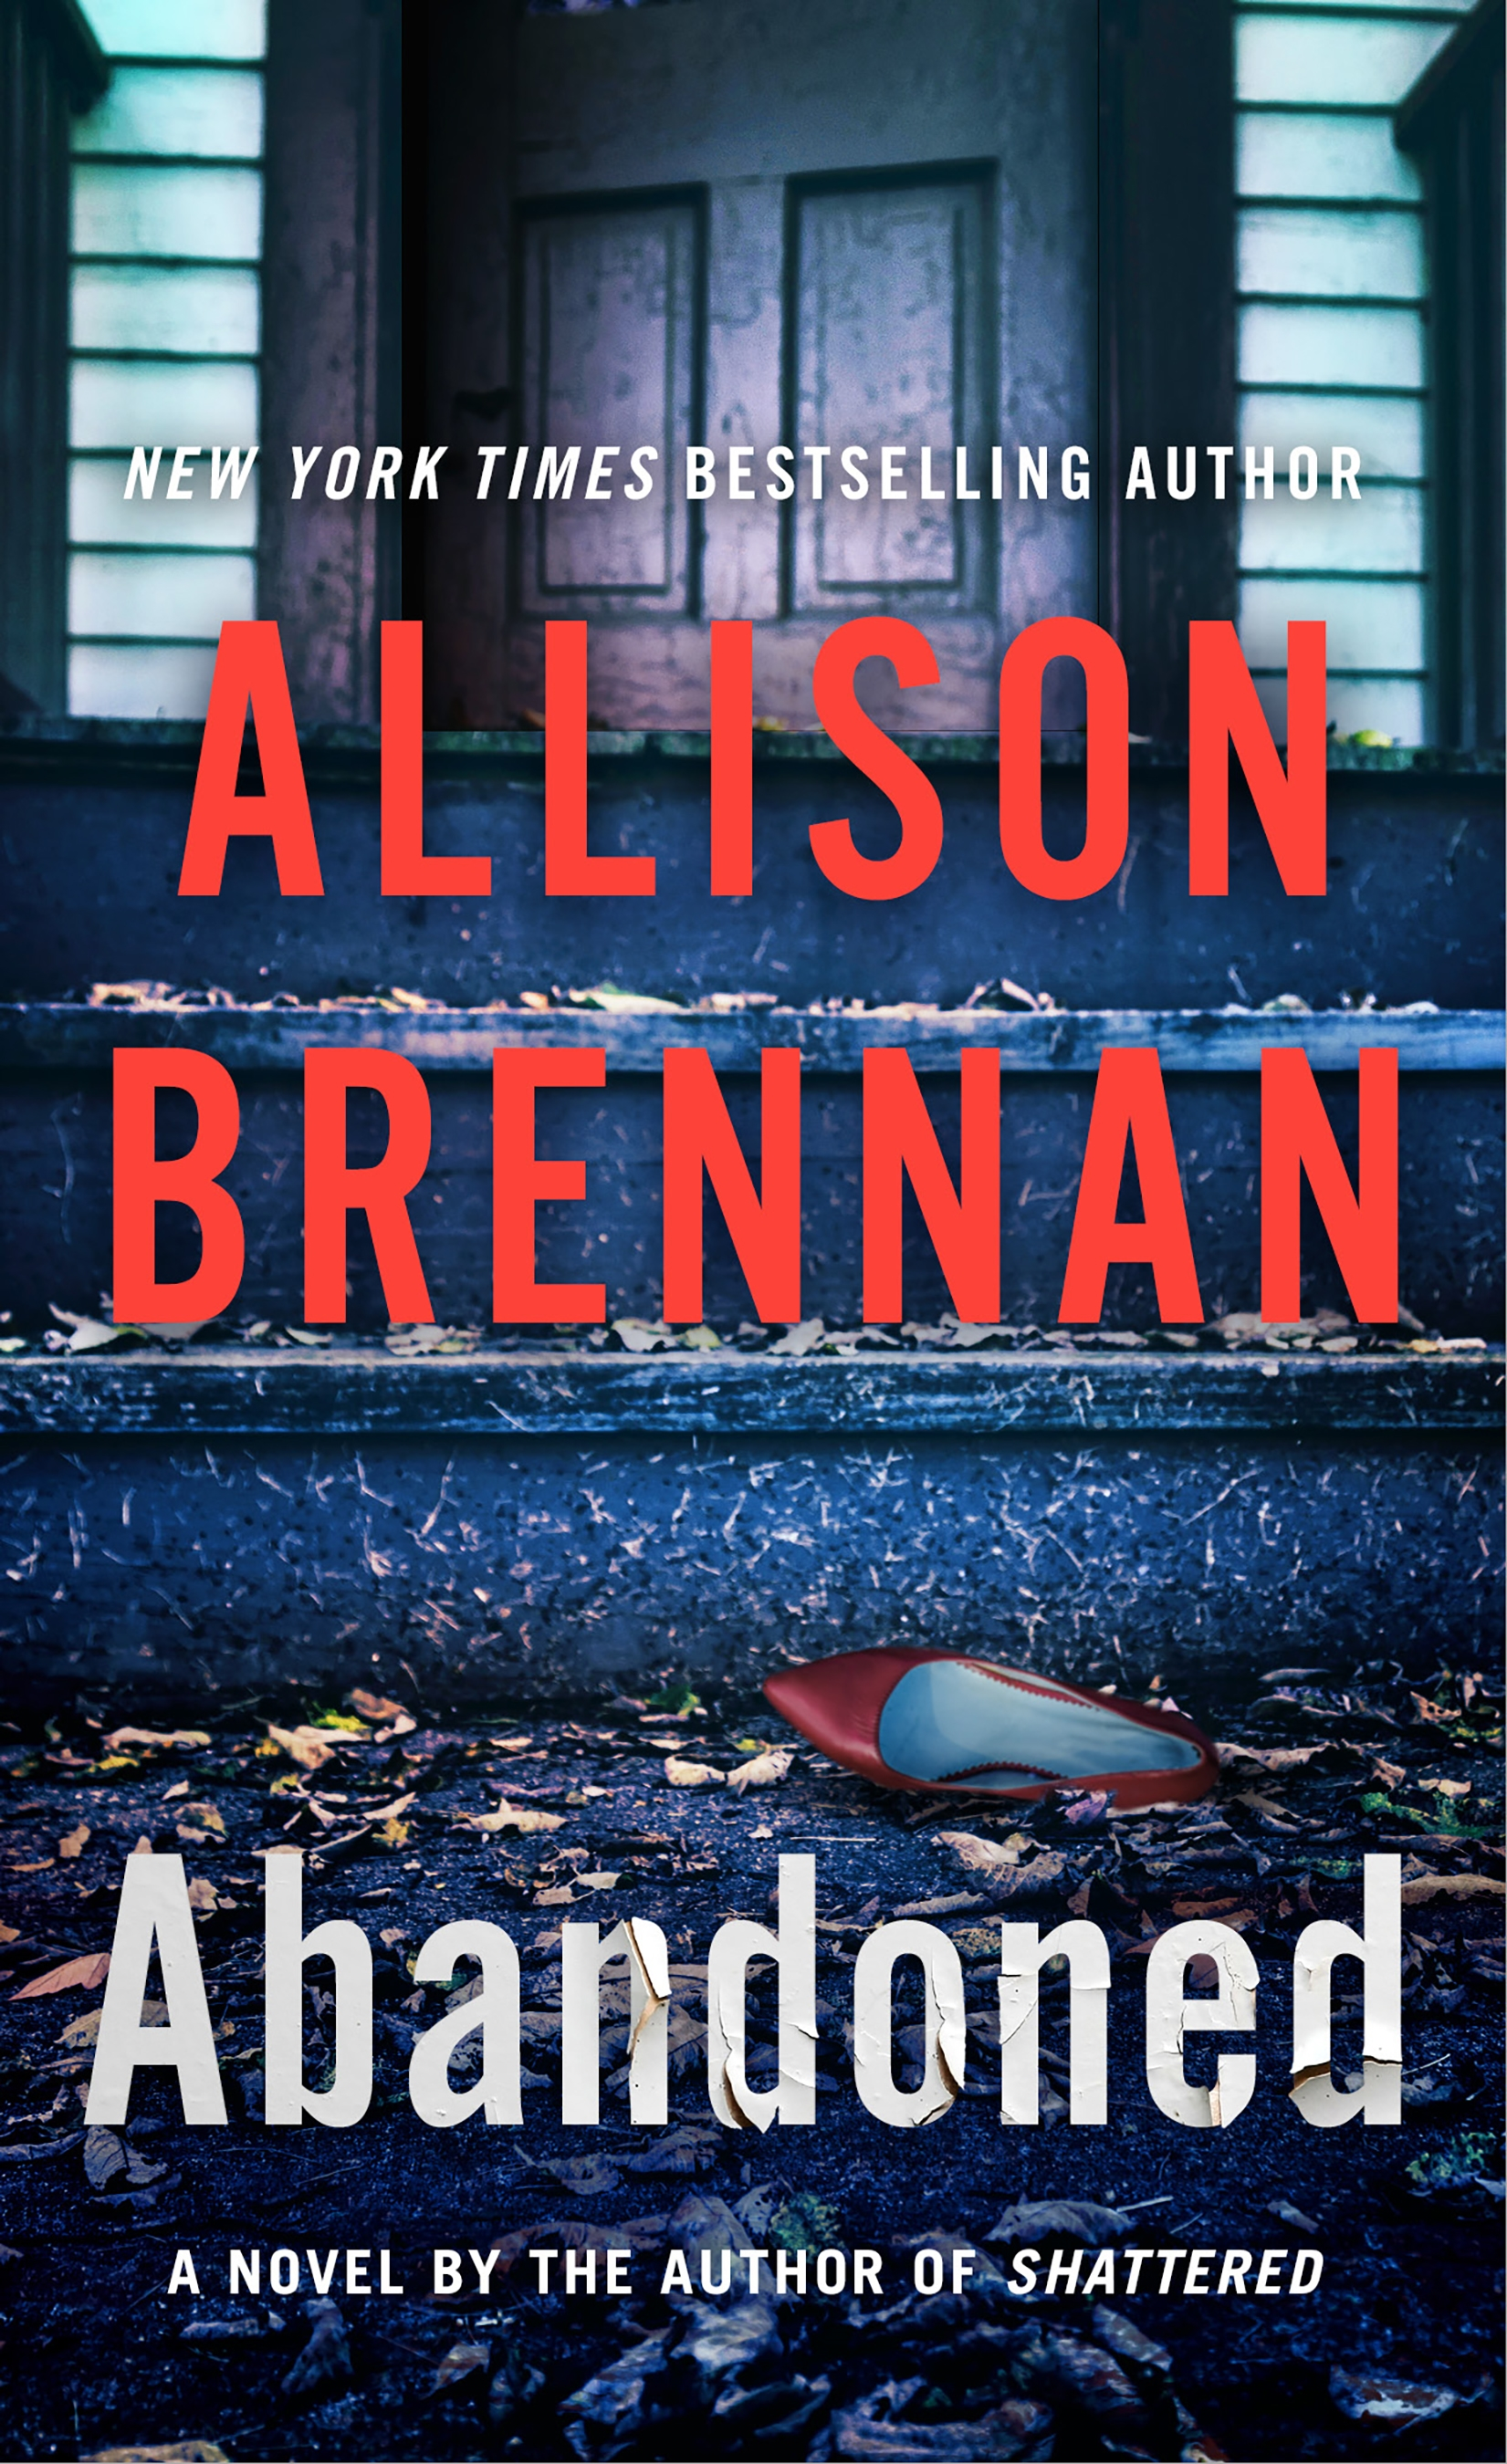 Abandoned [electronic resource] : A Novel